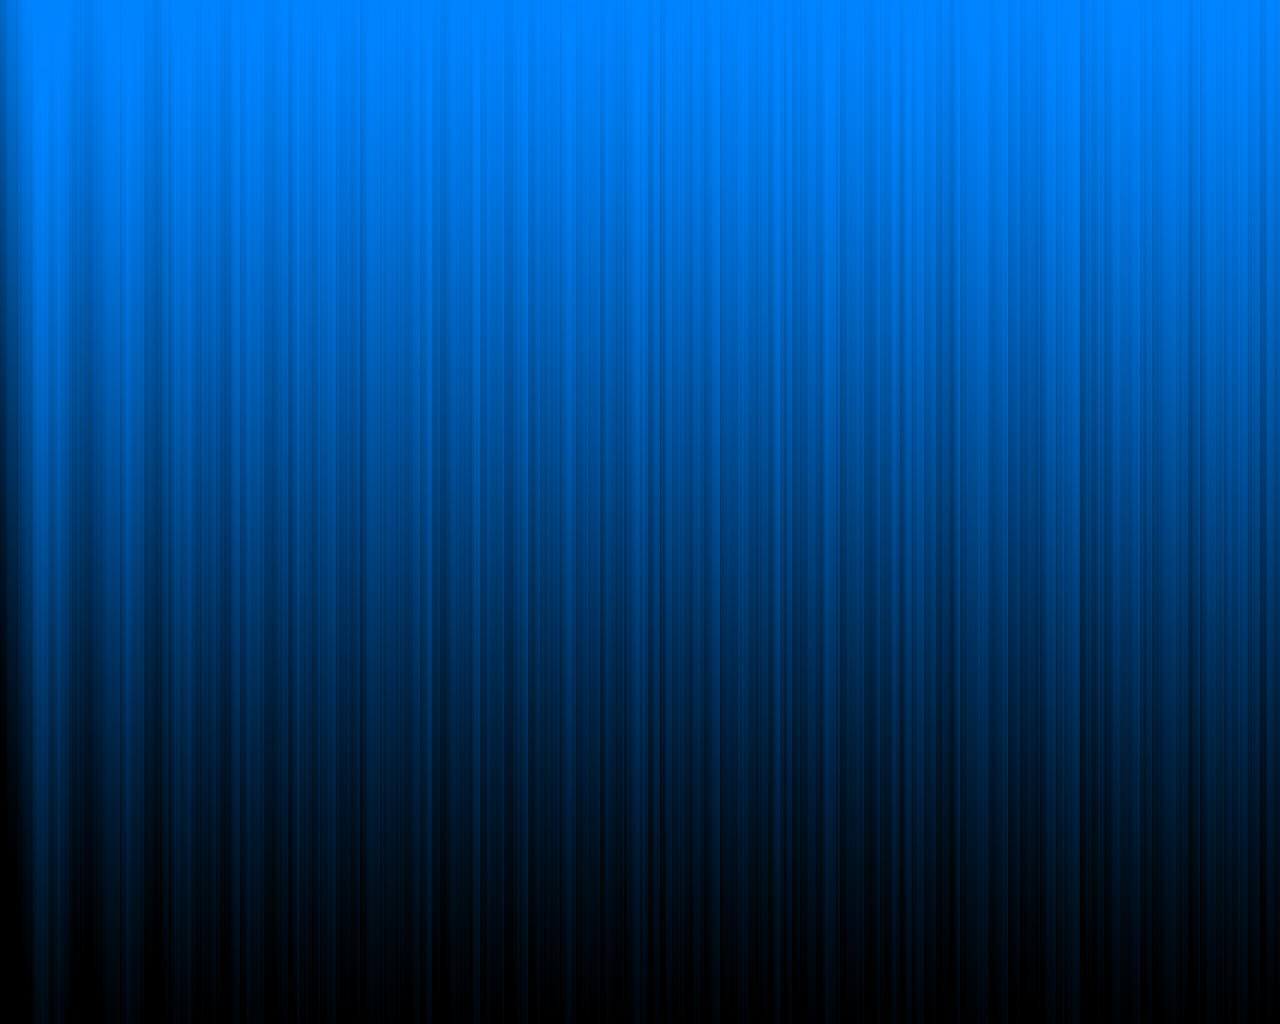 img-wallpapers-blue-wallpaper-juliomino-9957.jpg